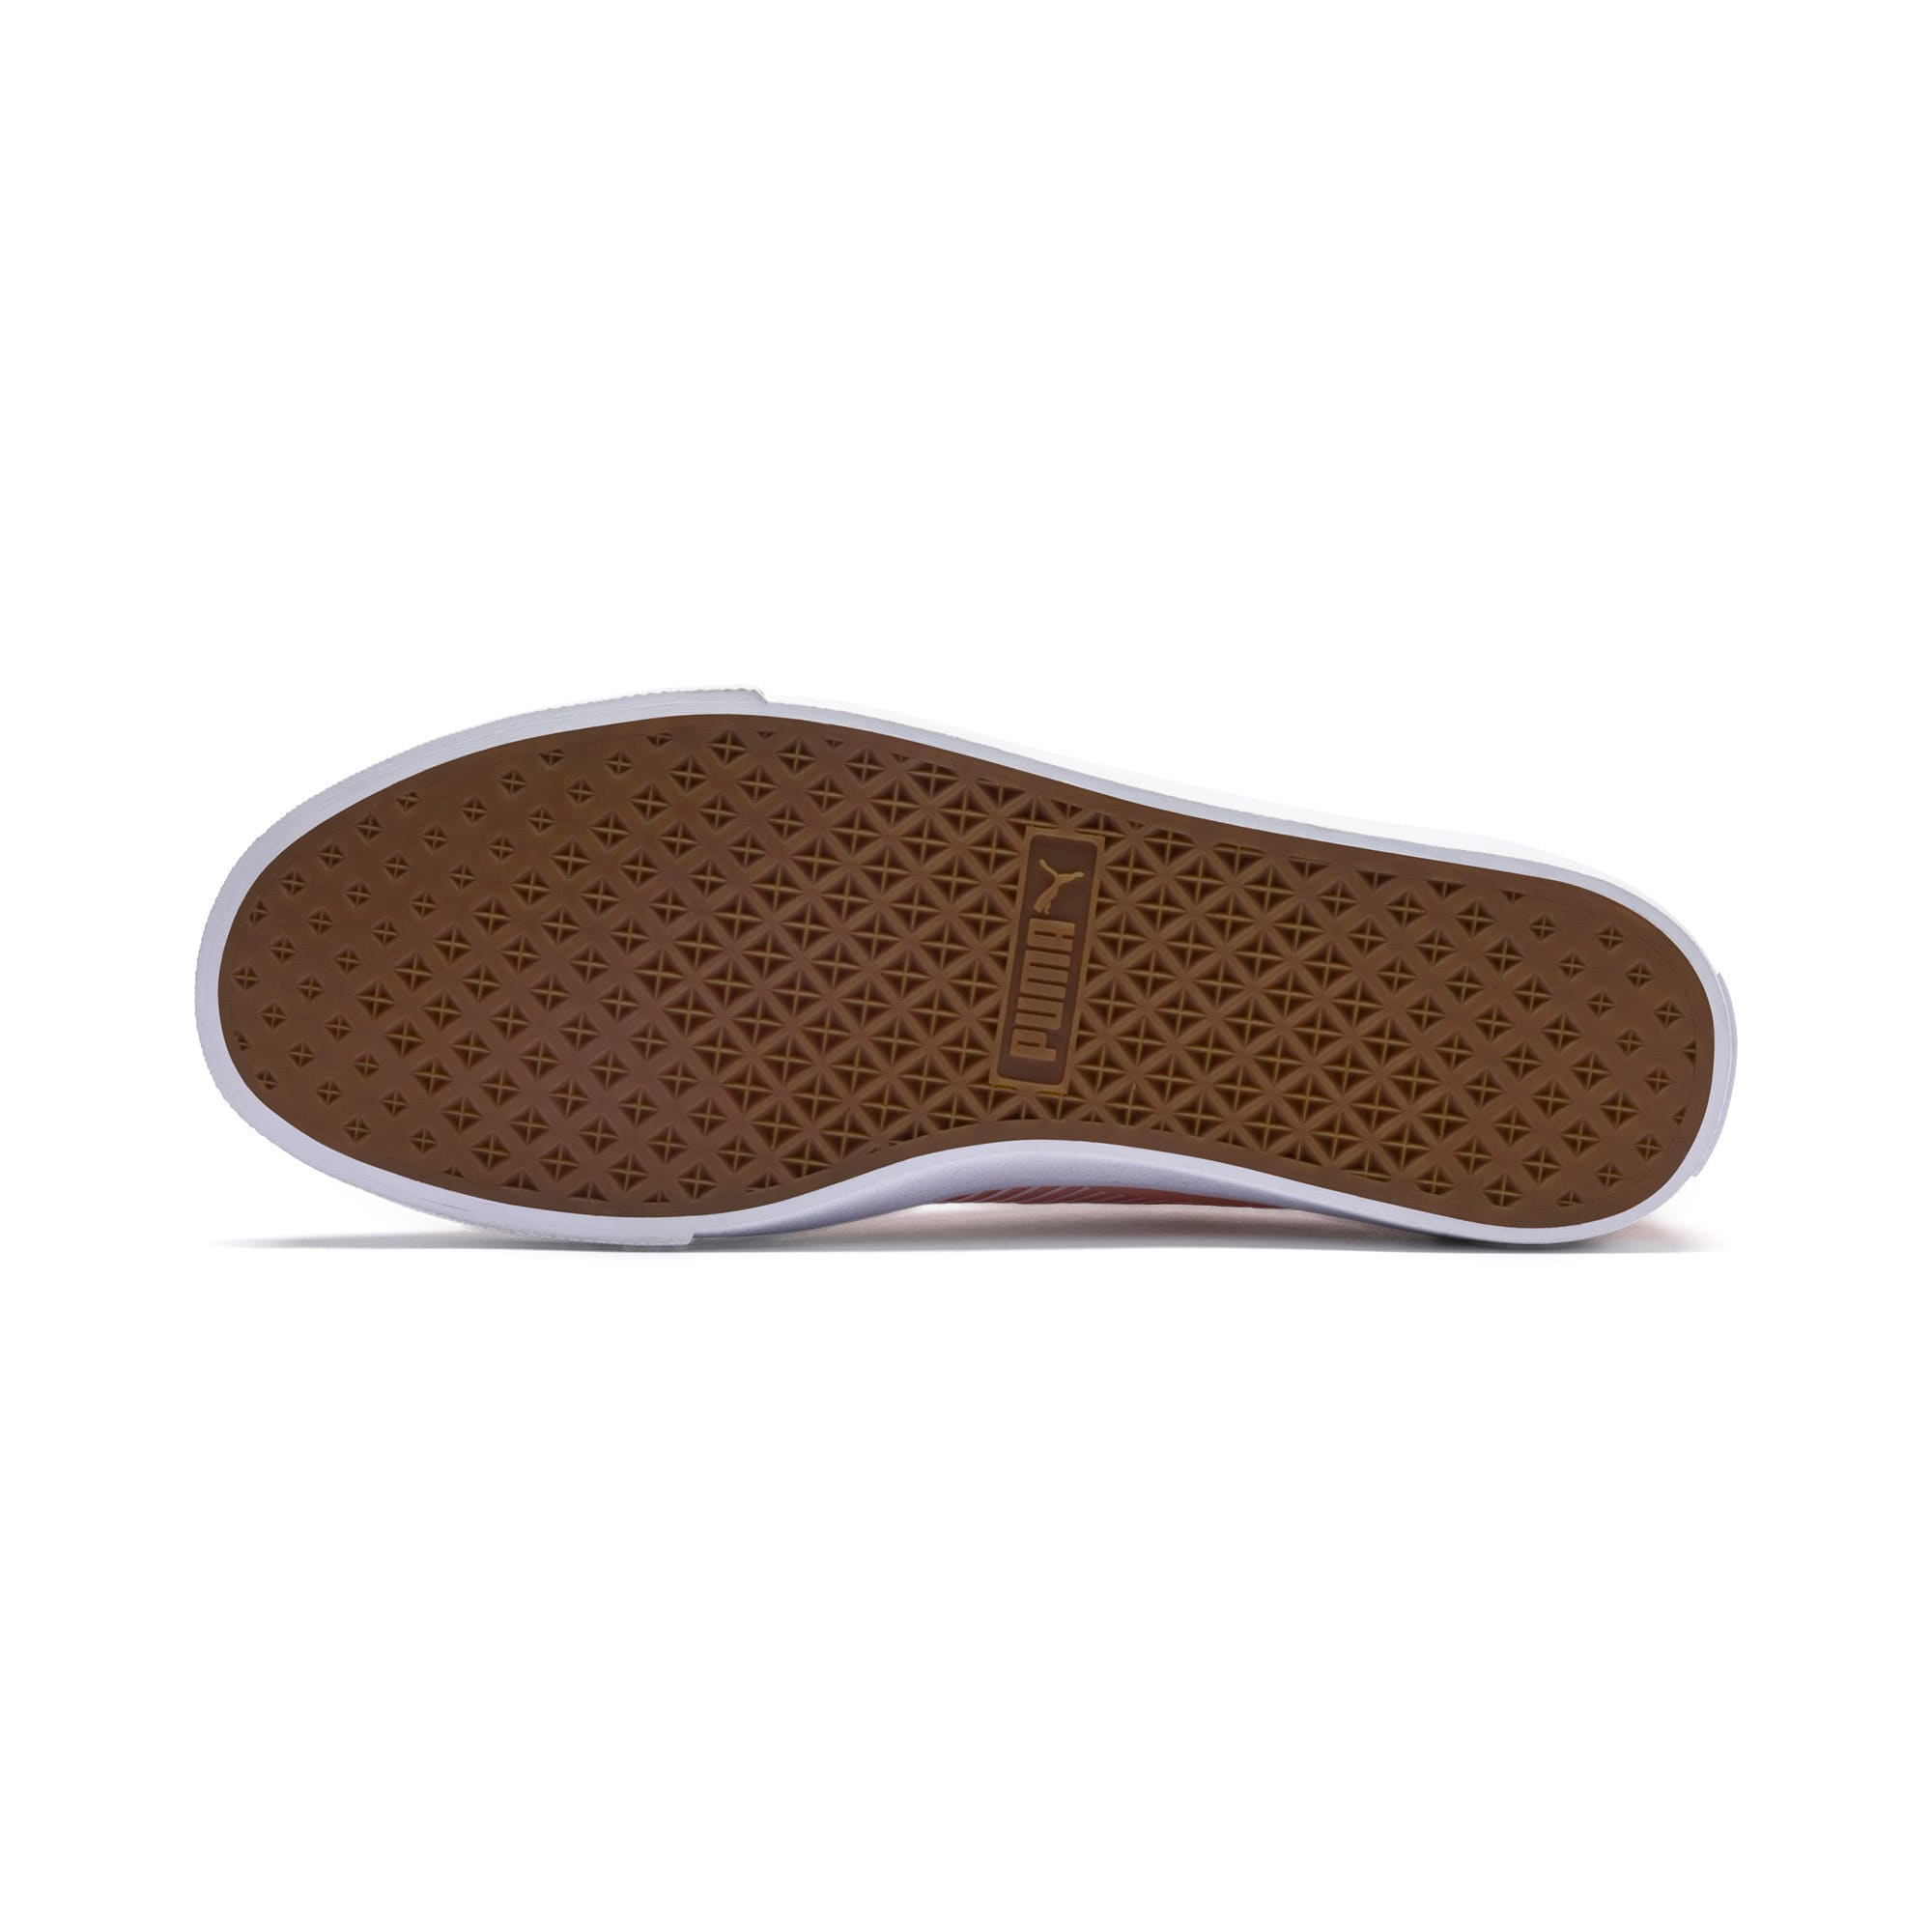 Thumbnail 3 of Bari Sneakers, Peach Bud-Puma White, medium